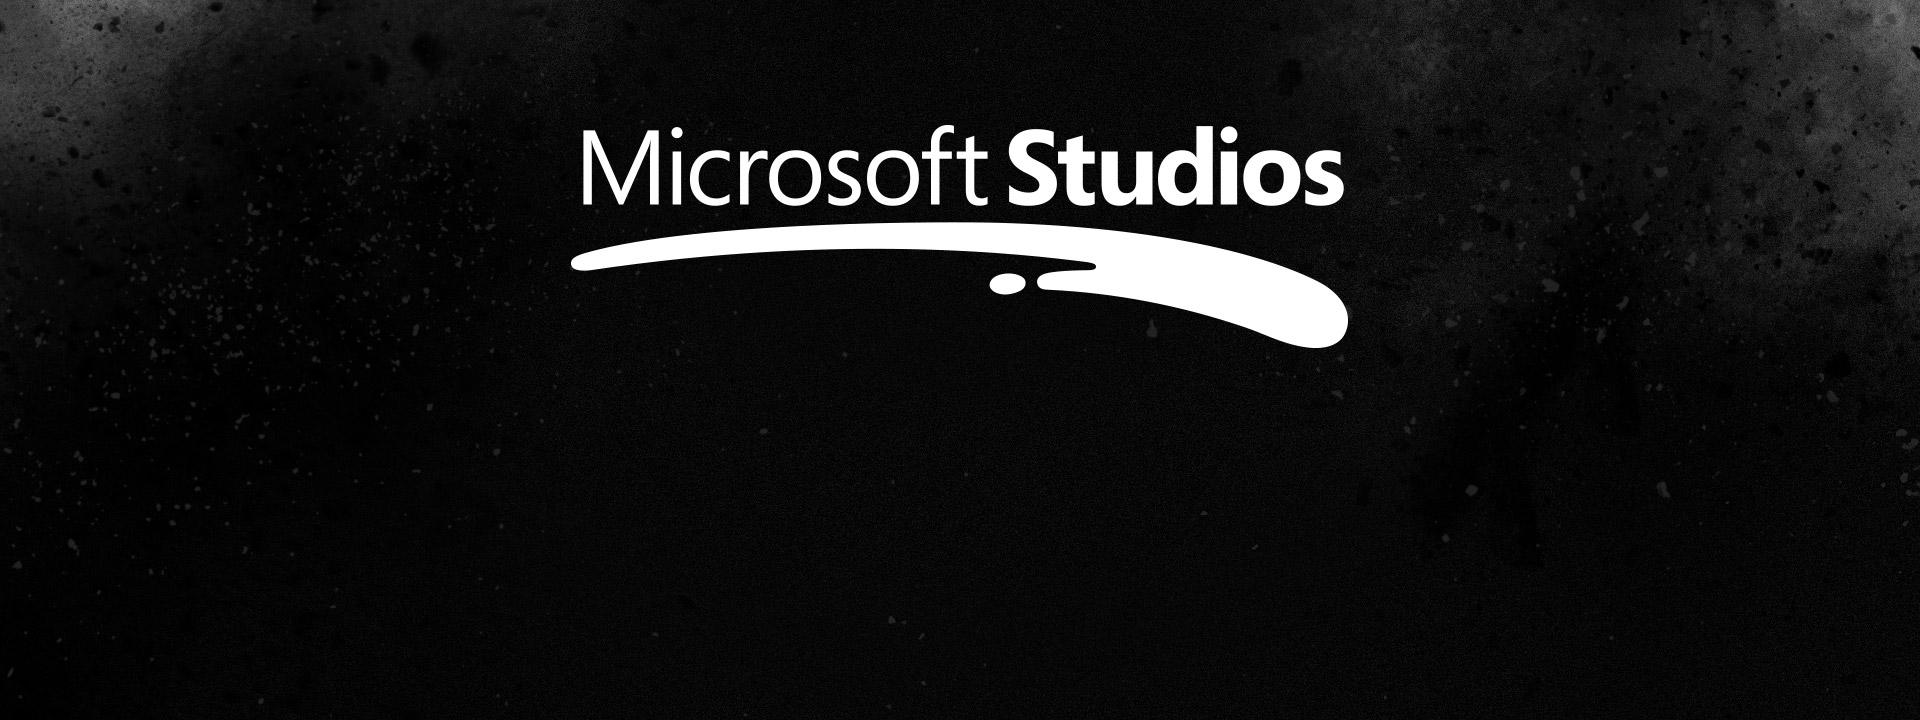 microsoft game studios - photo #13